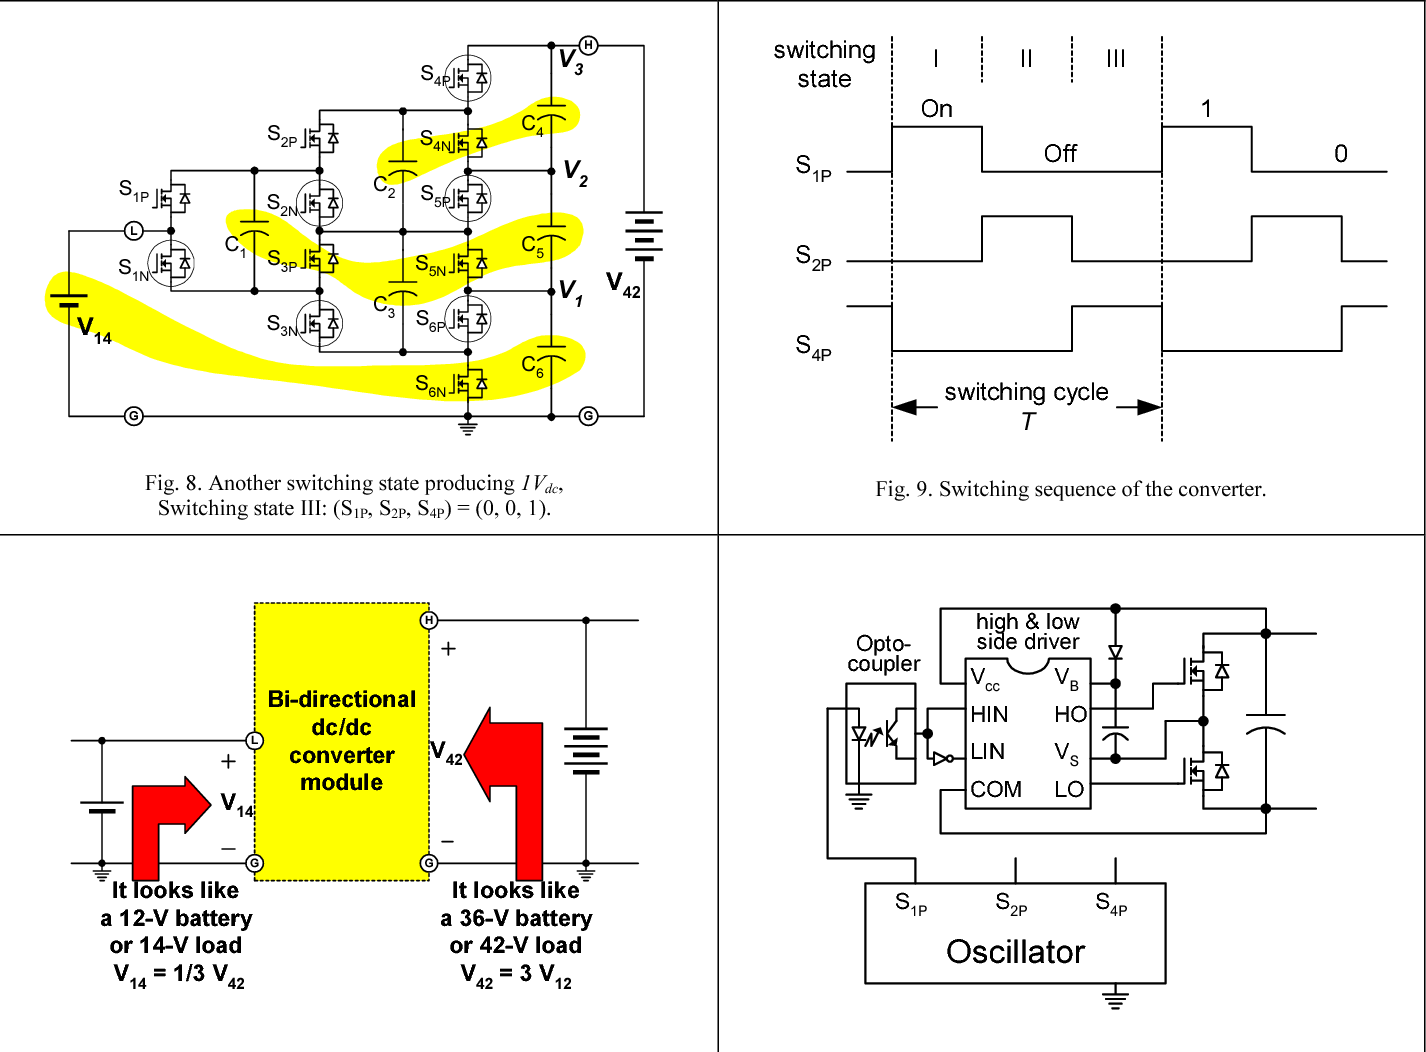 A Magnetic Less Dc Converter For Dual Voltage Automotive Systems Dctodcconverterpng Semantic Scholar